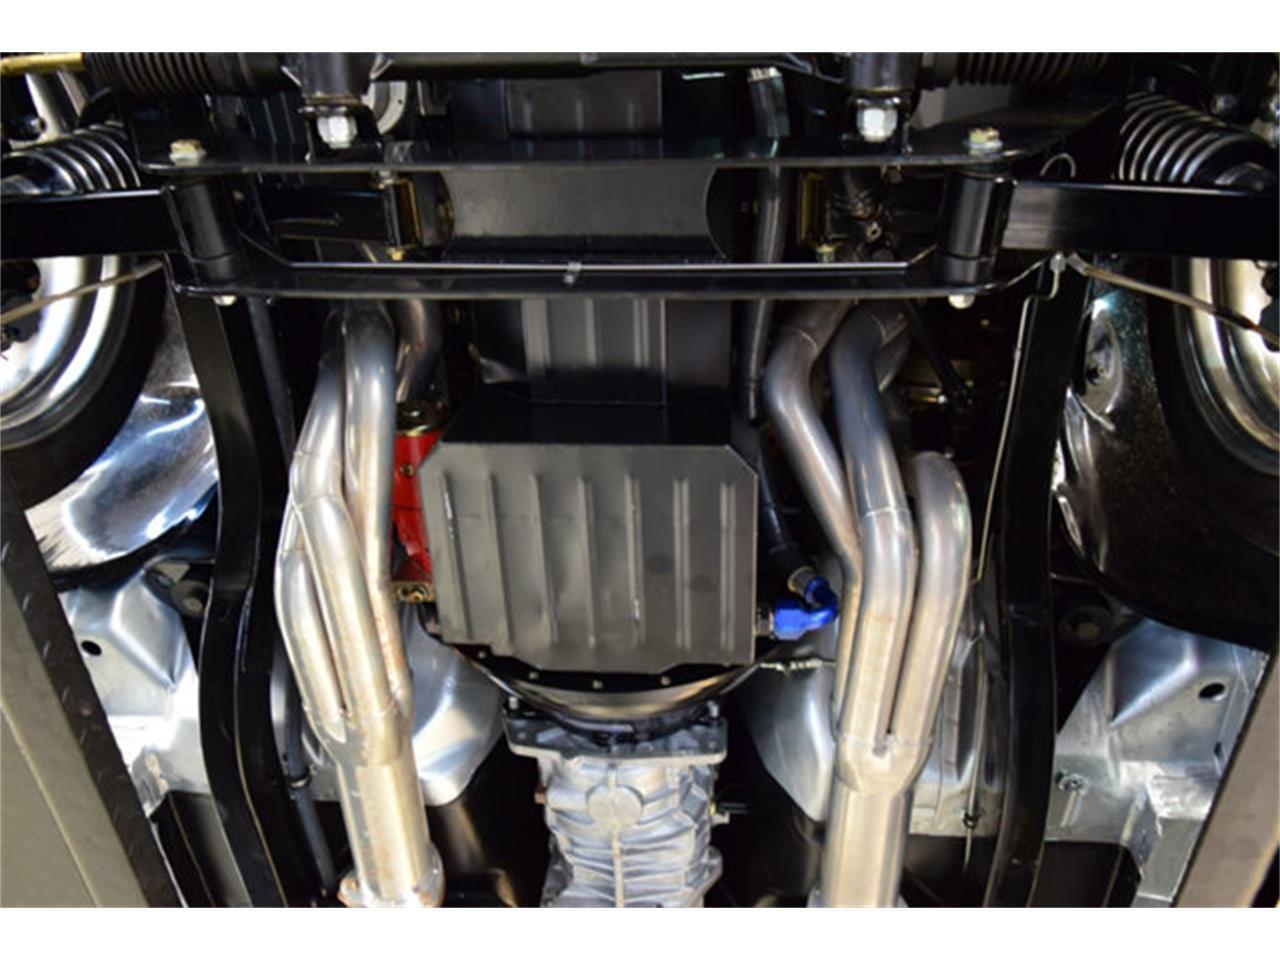 Large Picture of Classic 1968 Camaro located in North Carolina - $79,995.00 - LG6F